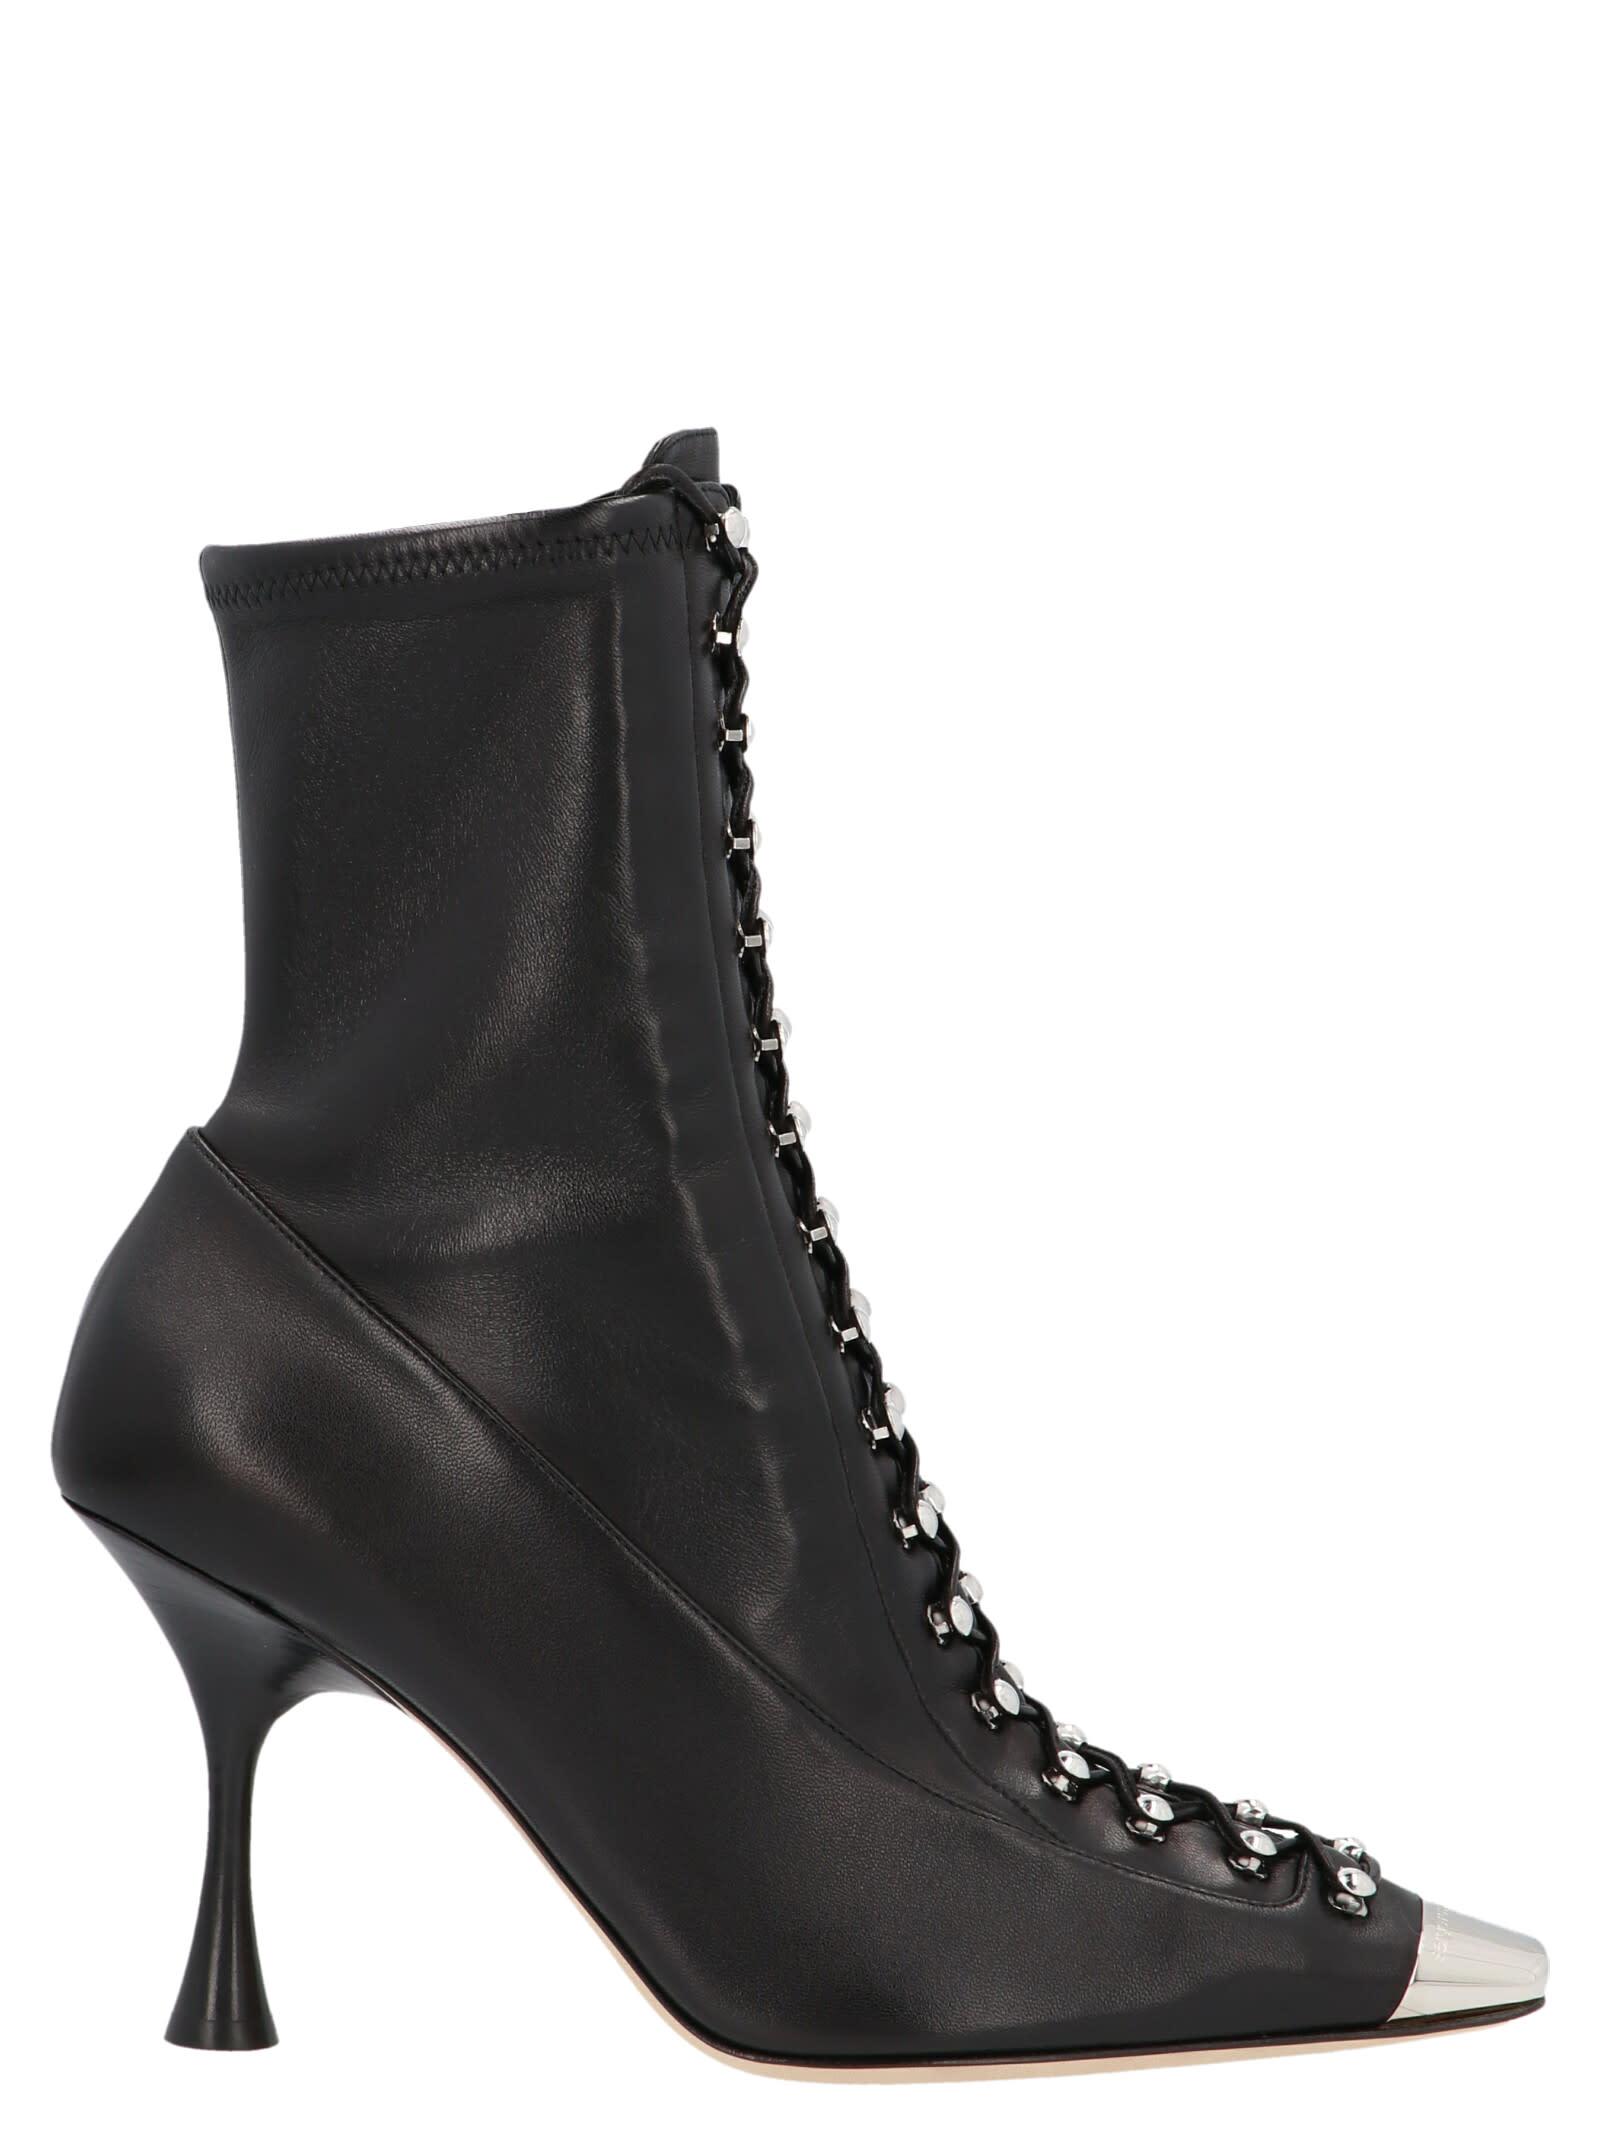 Sergio Rossi twenty Metal Shoes